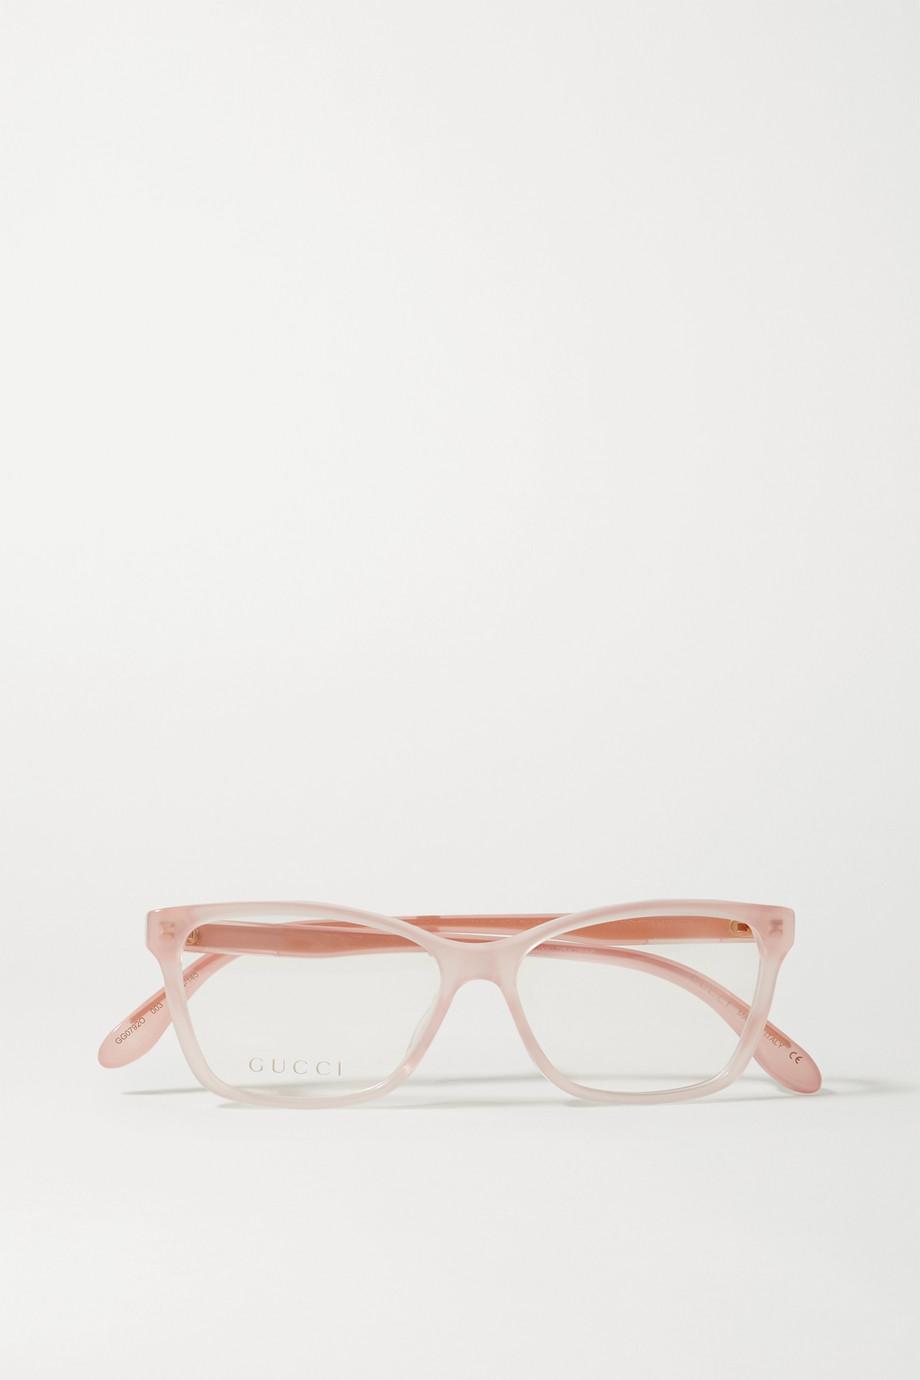 Gucci D-frame acetate optical glasses